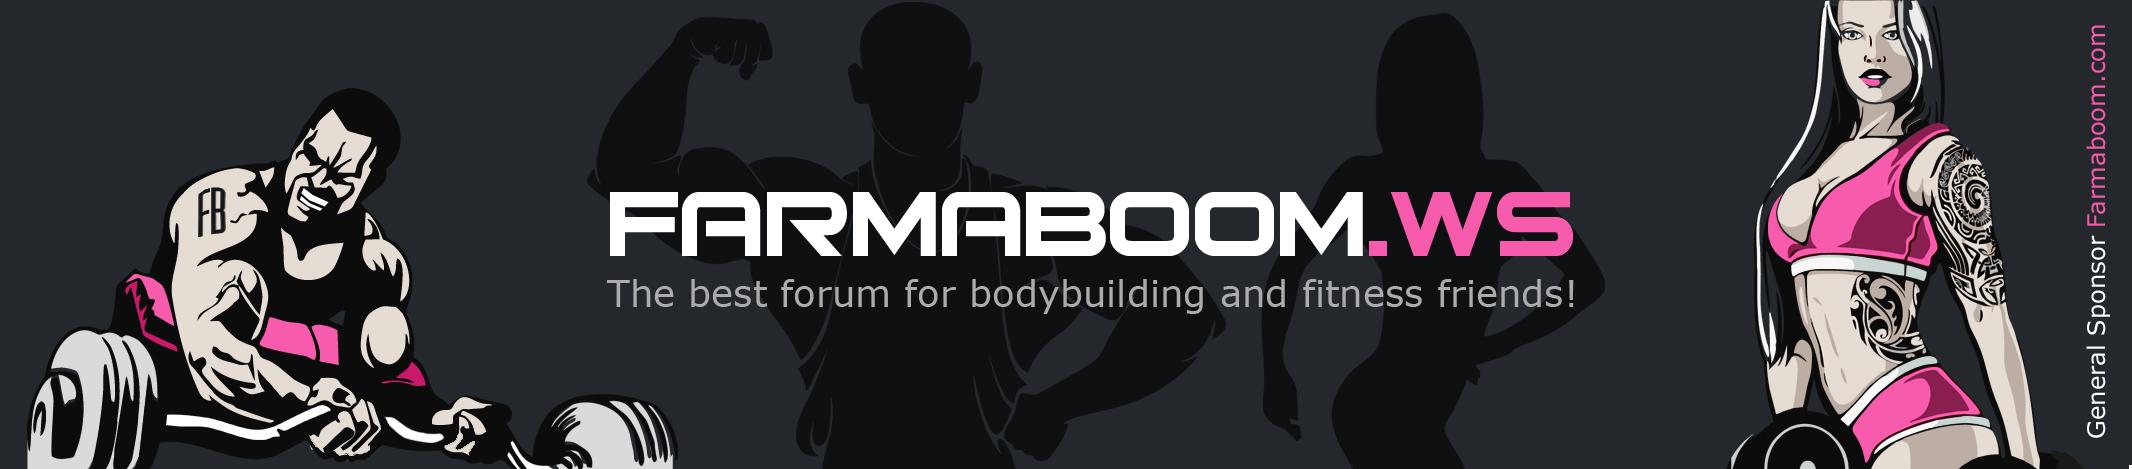 farmaboom